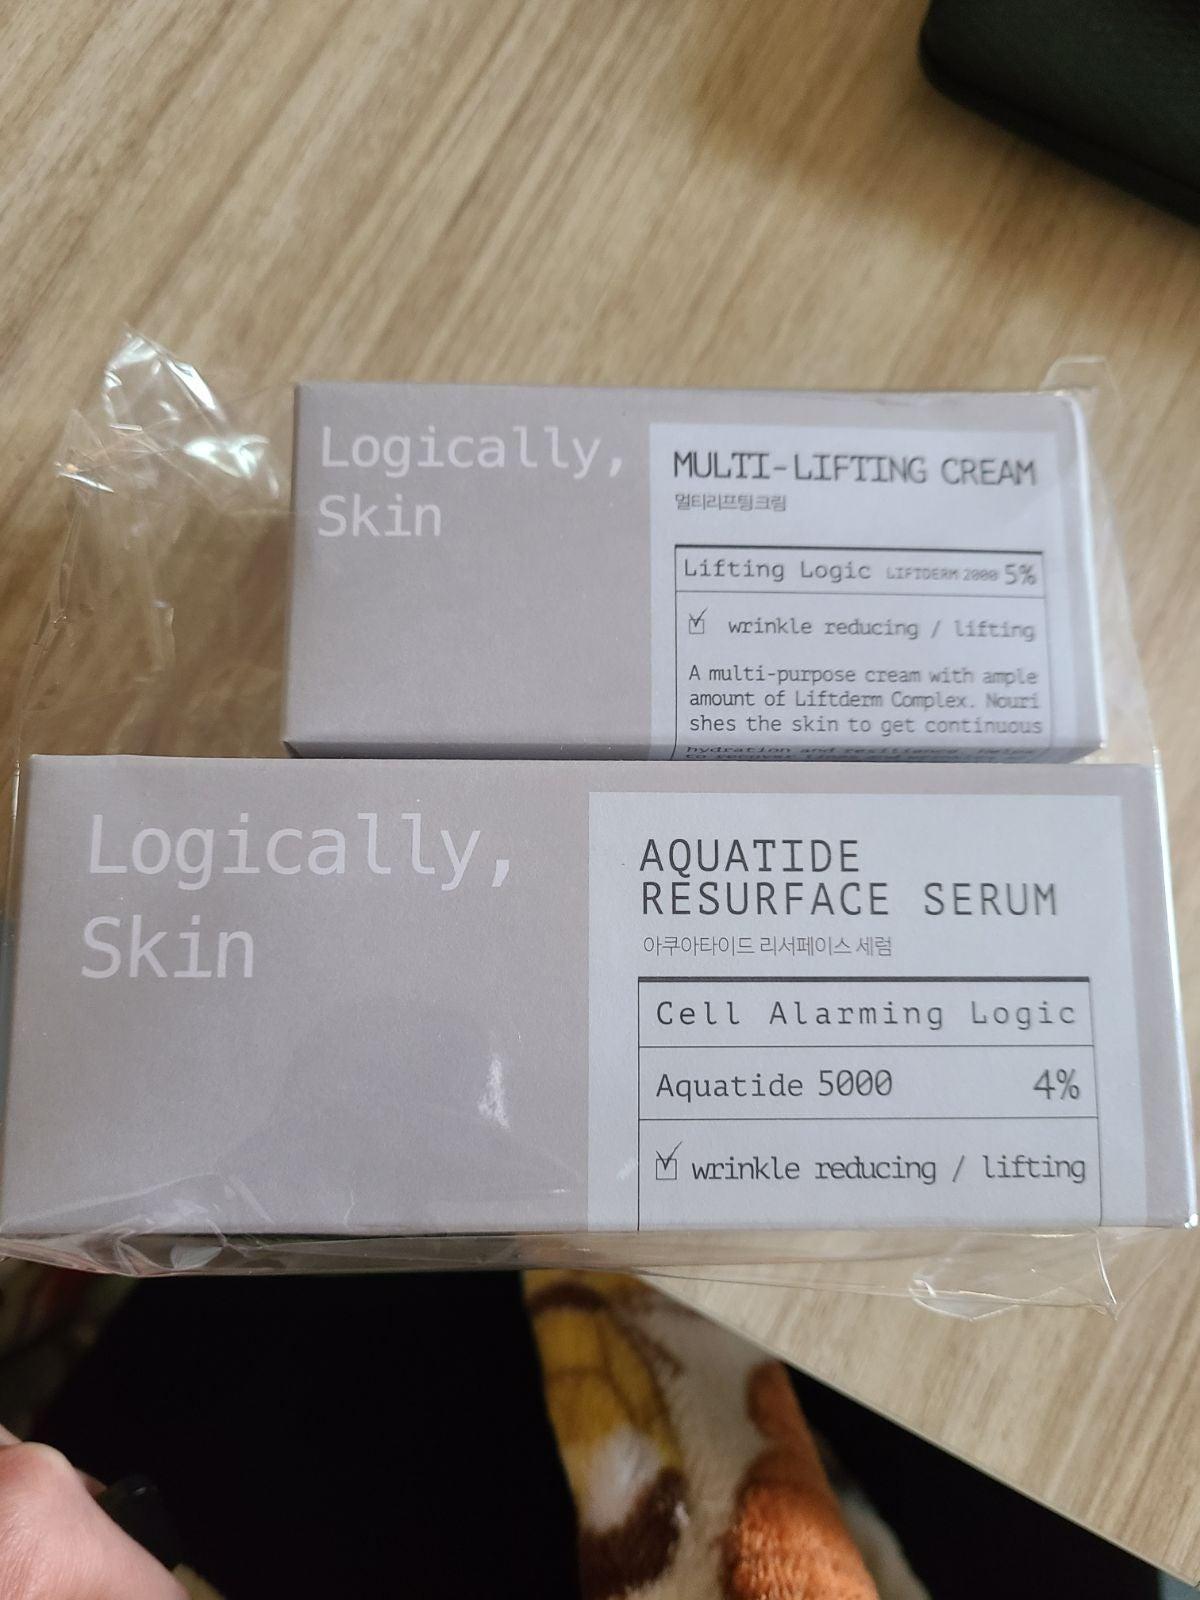 Logically Skin lifting cream & resurface